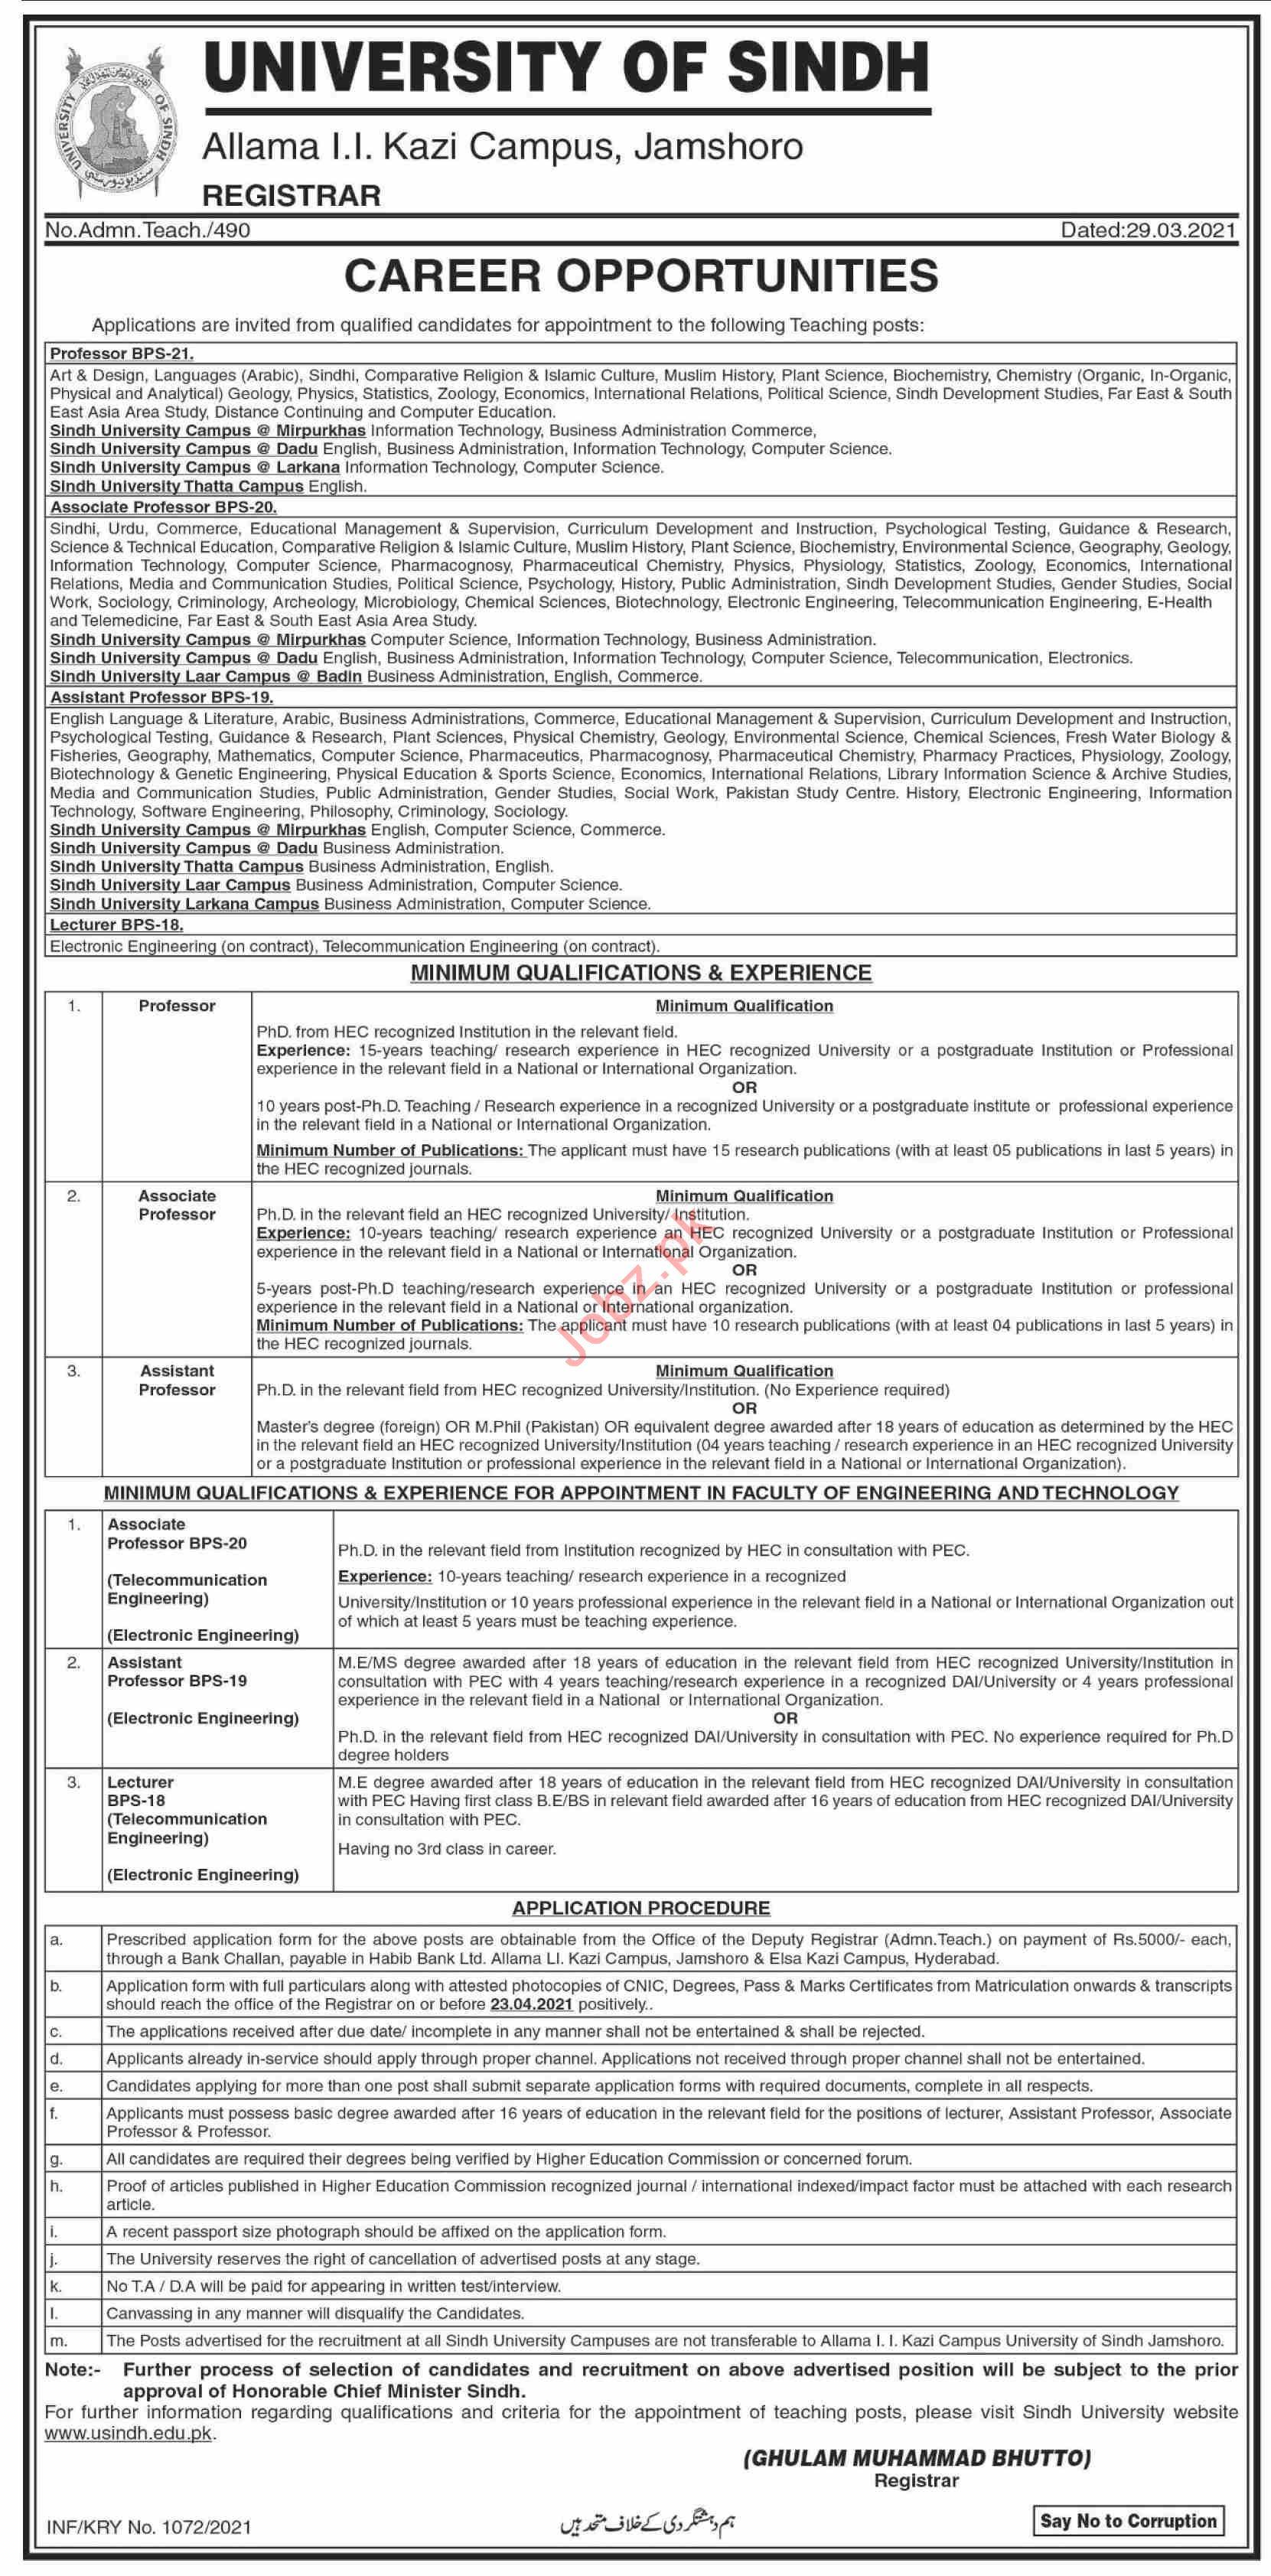 University of Sindh Jamshoro Jobs 2021 for Professors